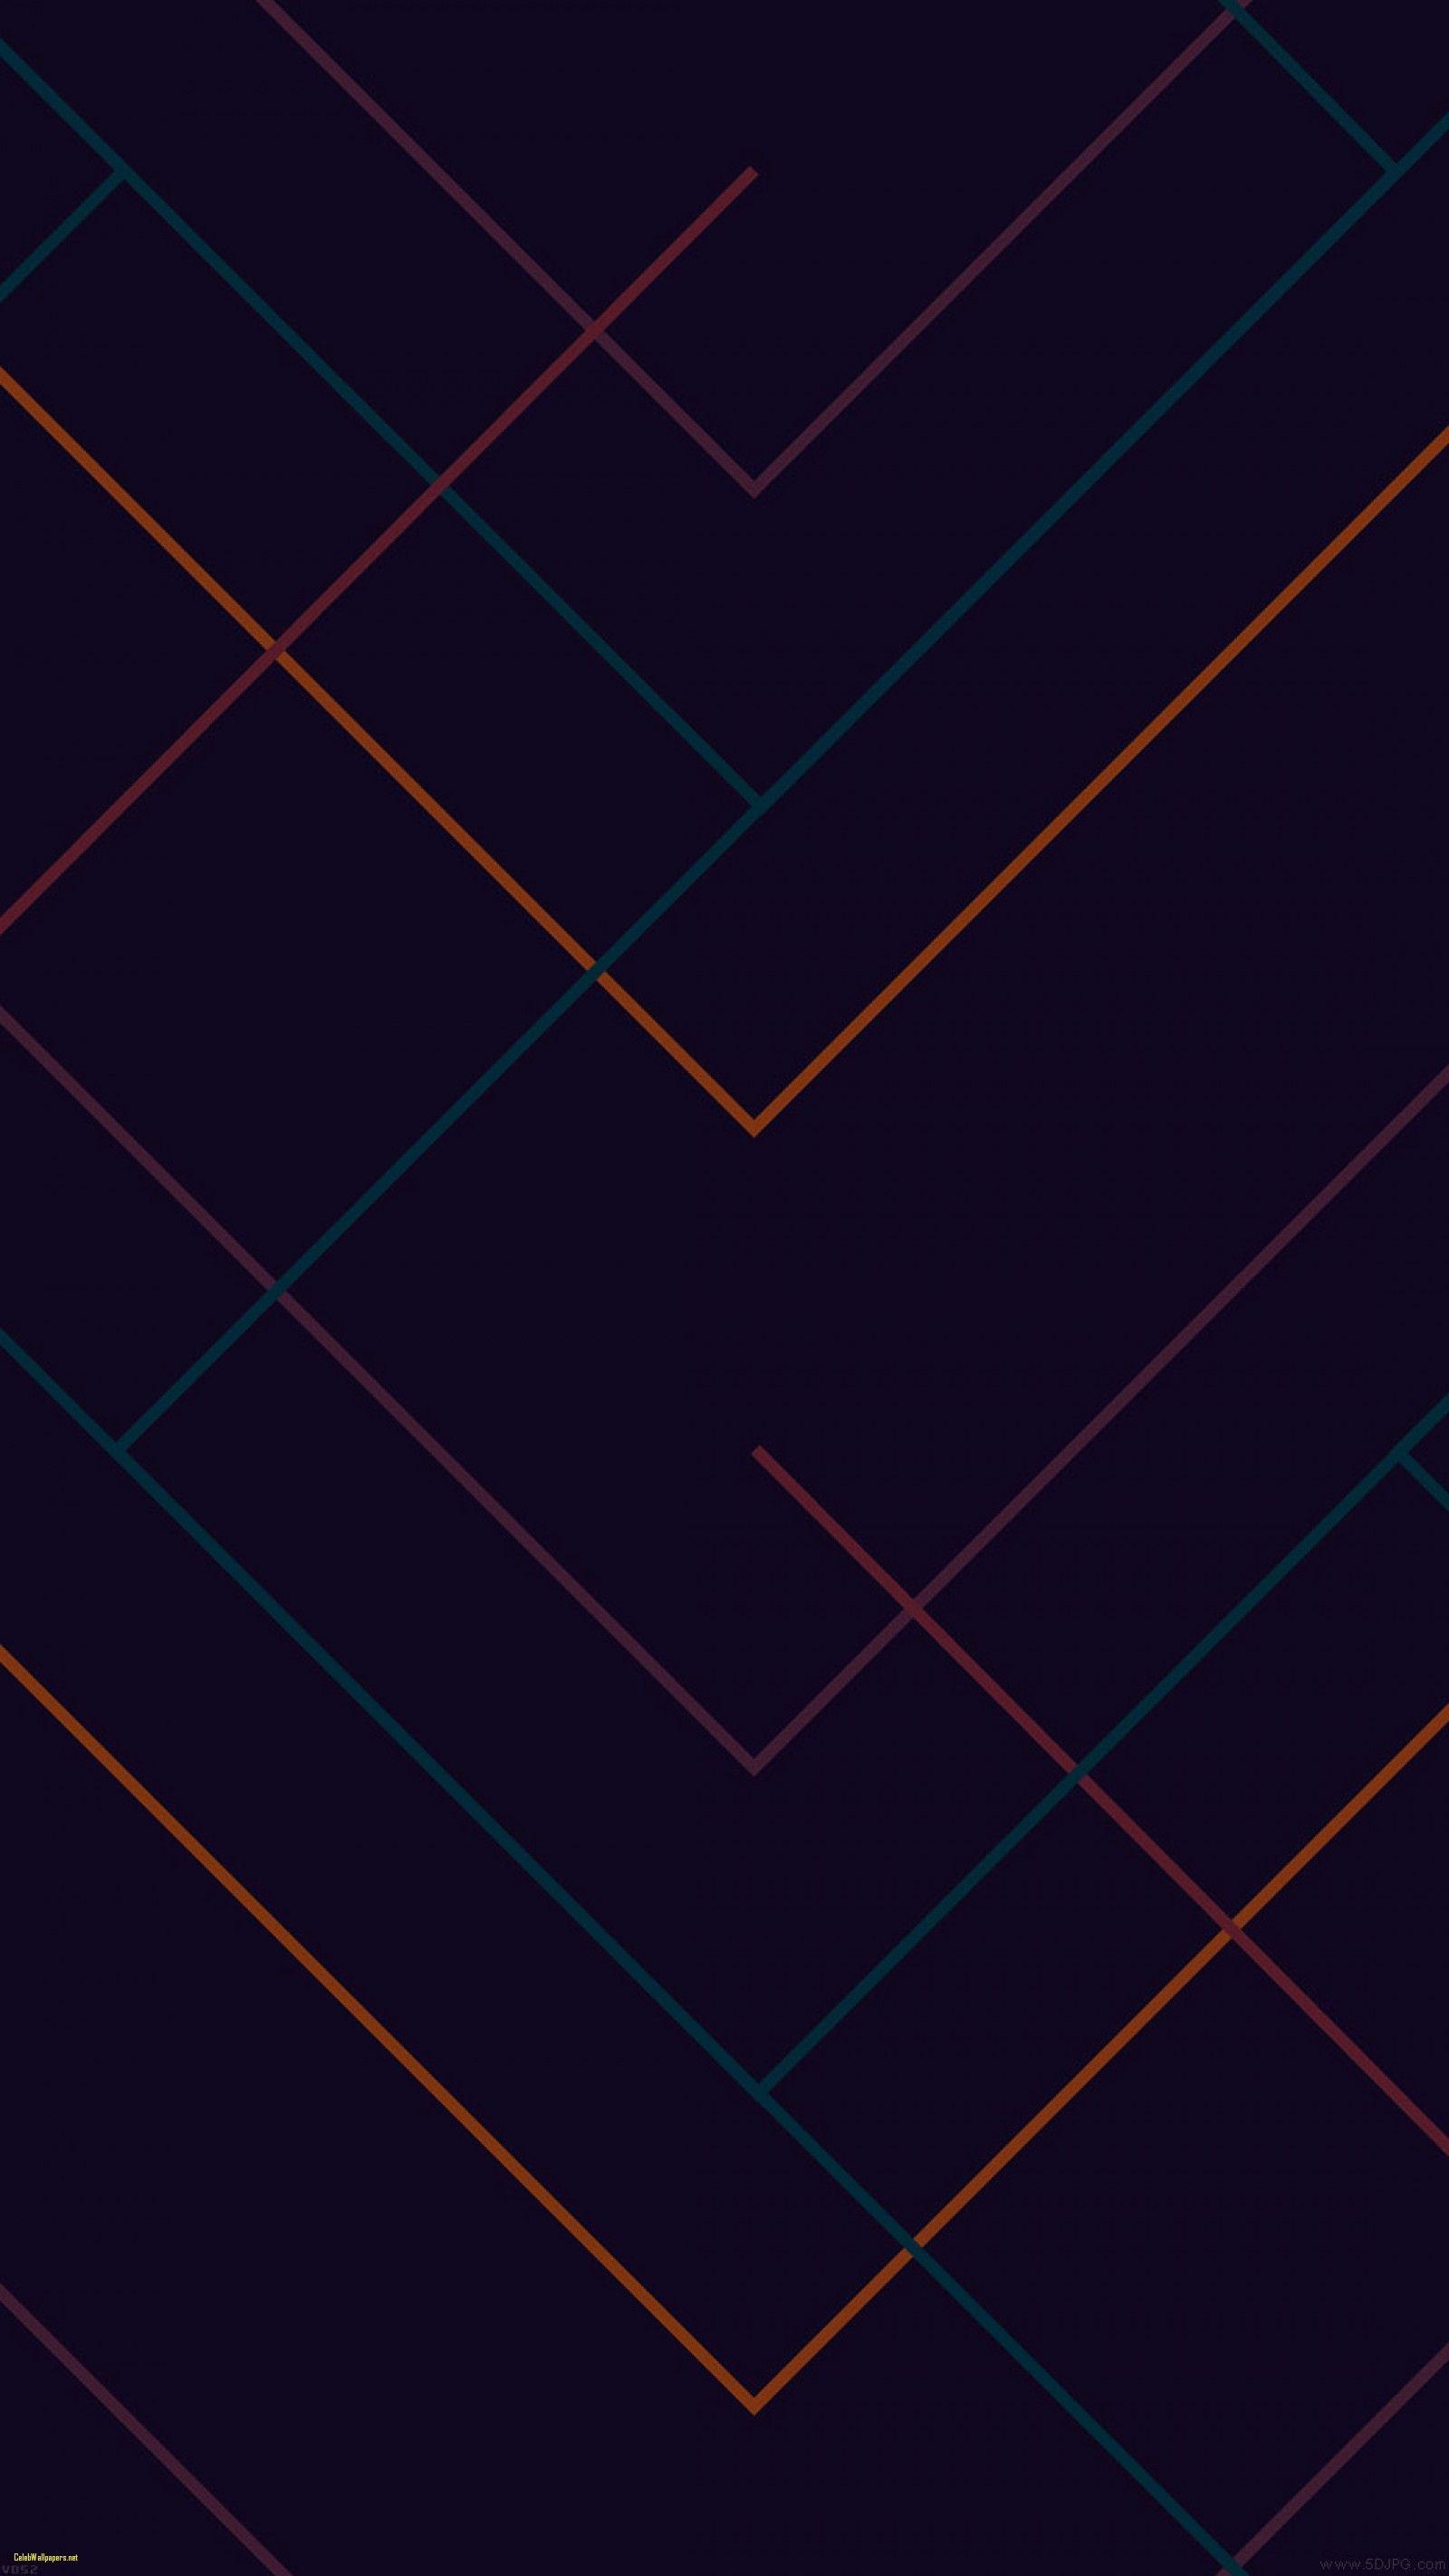 Abstract Wallpaper For Android Group 34 Download For Free Fondos Electronicos Fondo De Pantalla De Android Descargas De Fondos De Pantalla